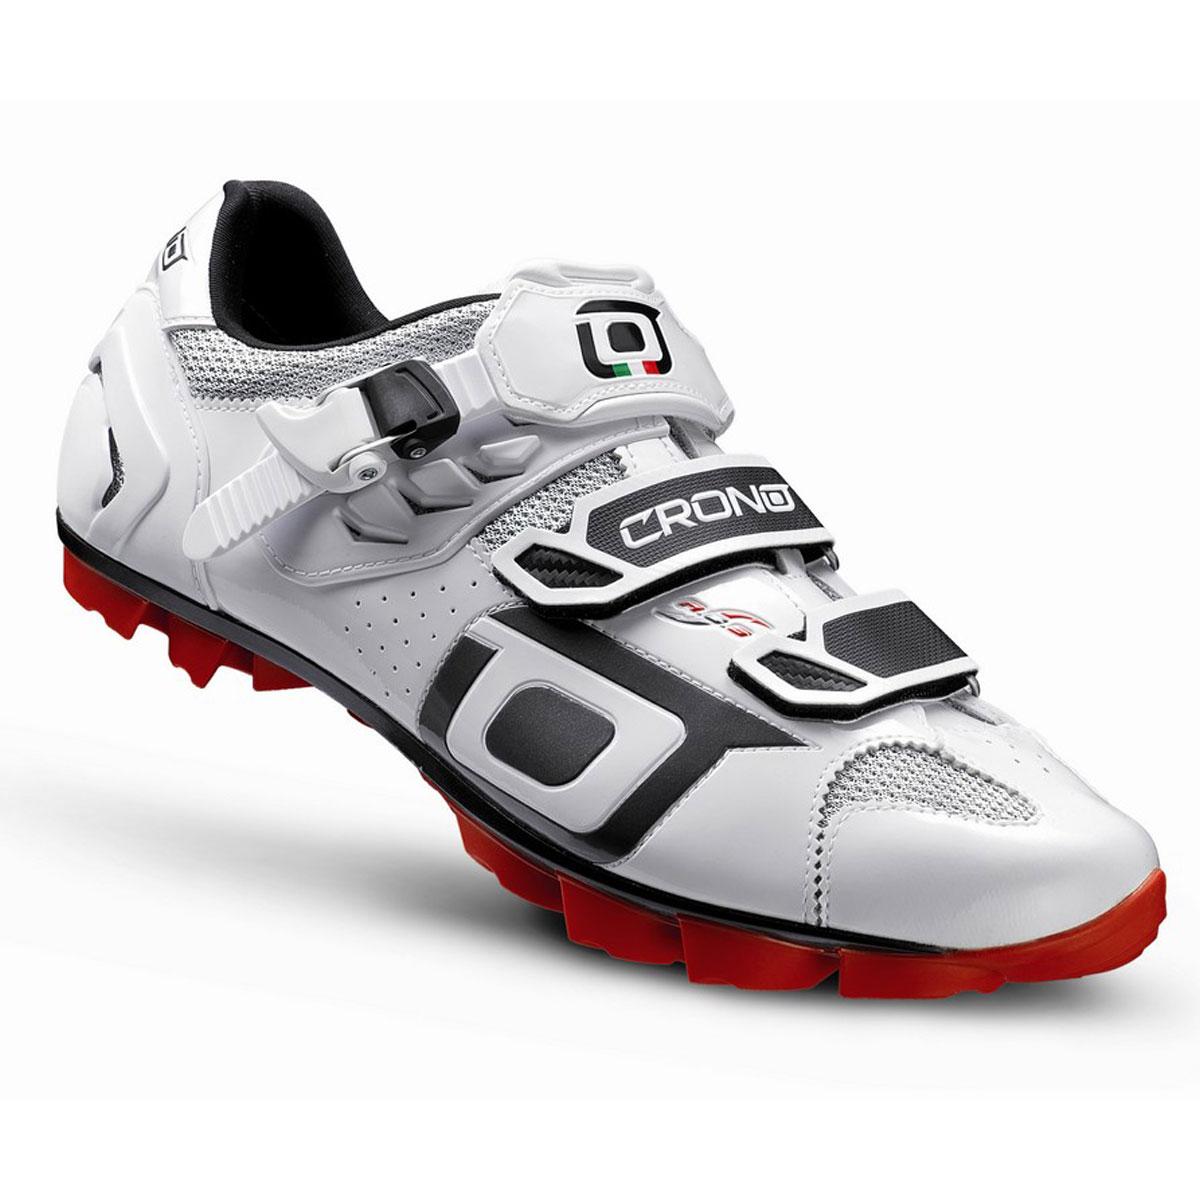 Boty Crono MTB Track white, 39